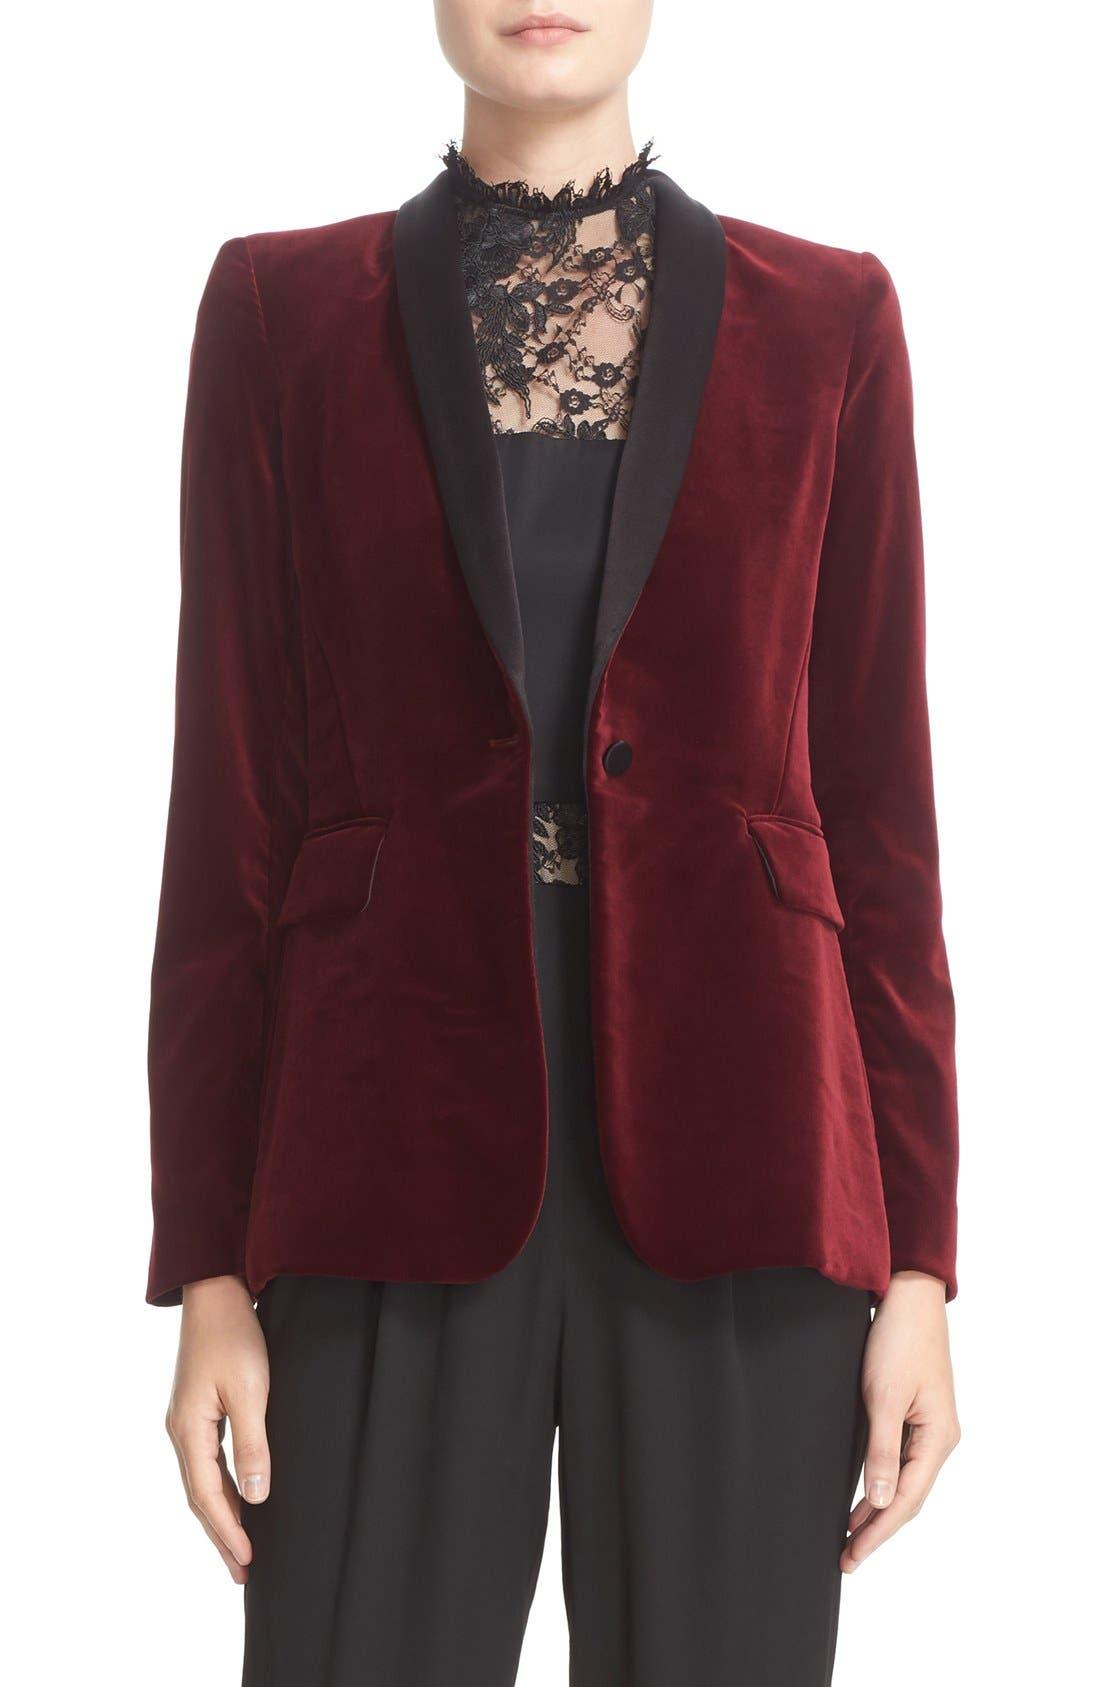 Alternate Image 1 Selected - Alice + Olivia 'Macey' Satin Lapel Velvet One-Button Blazer